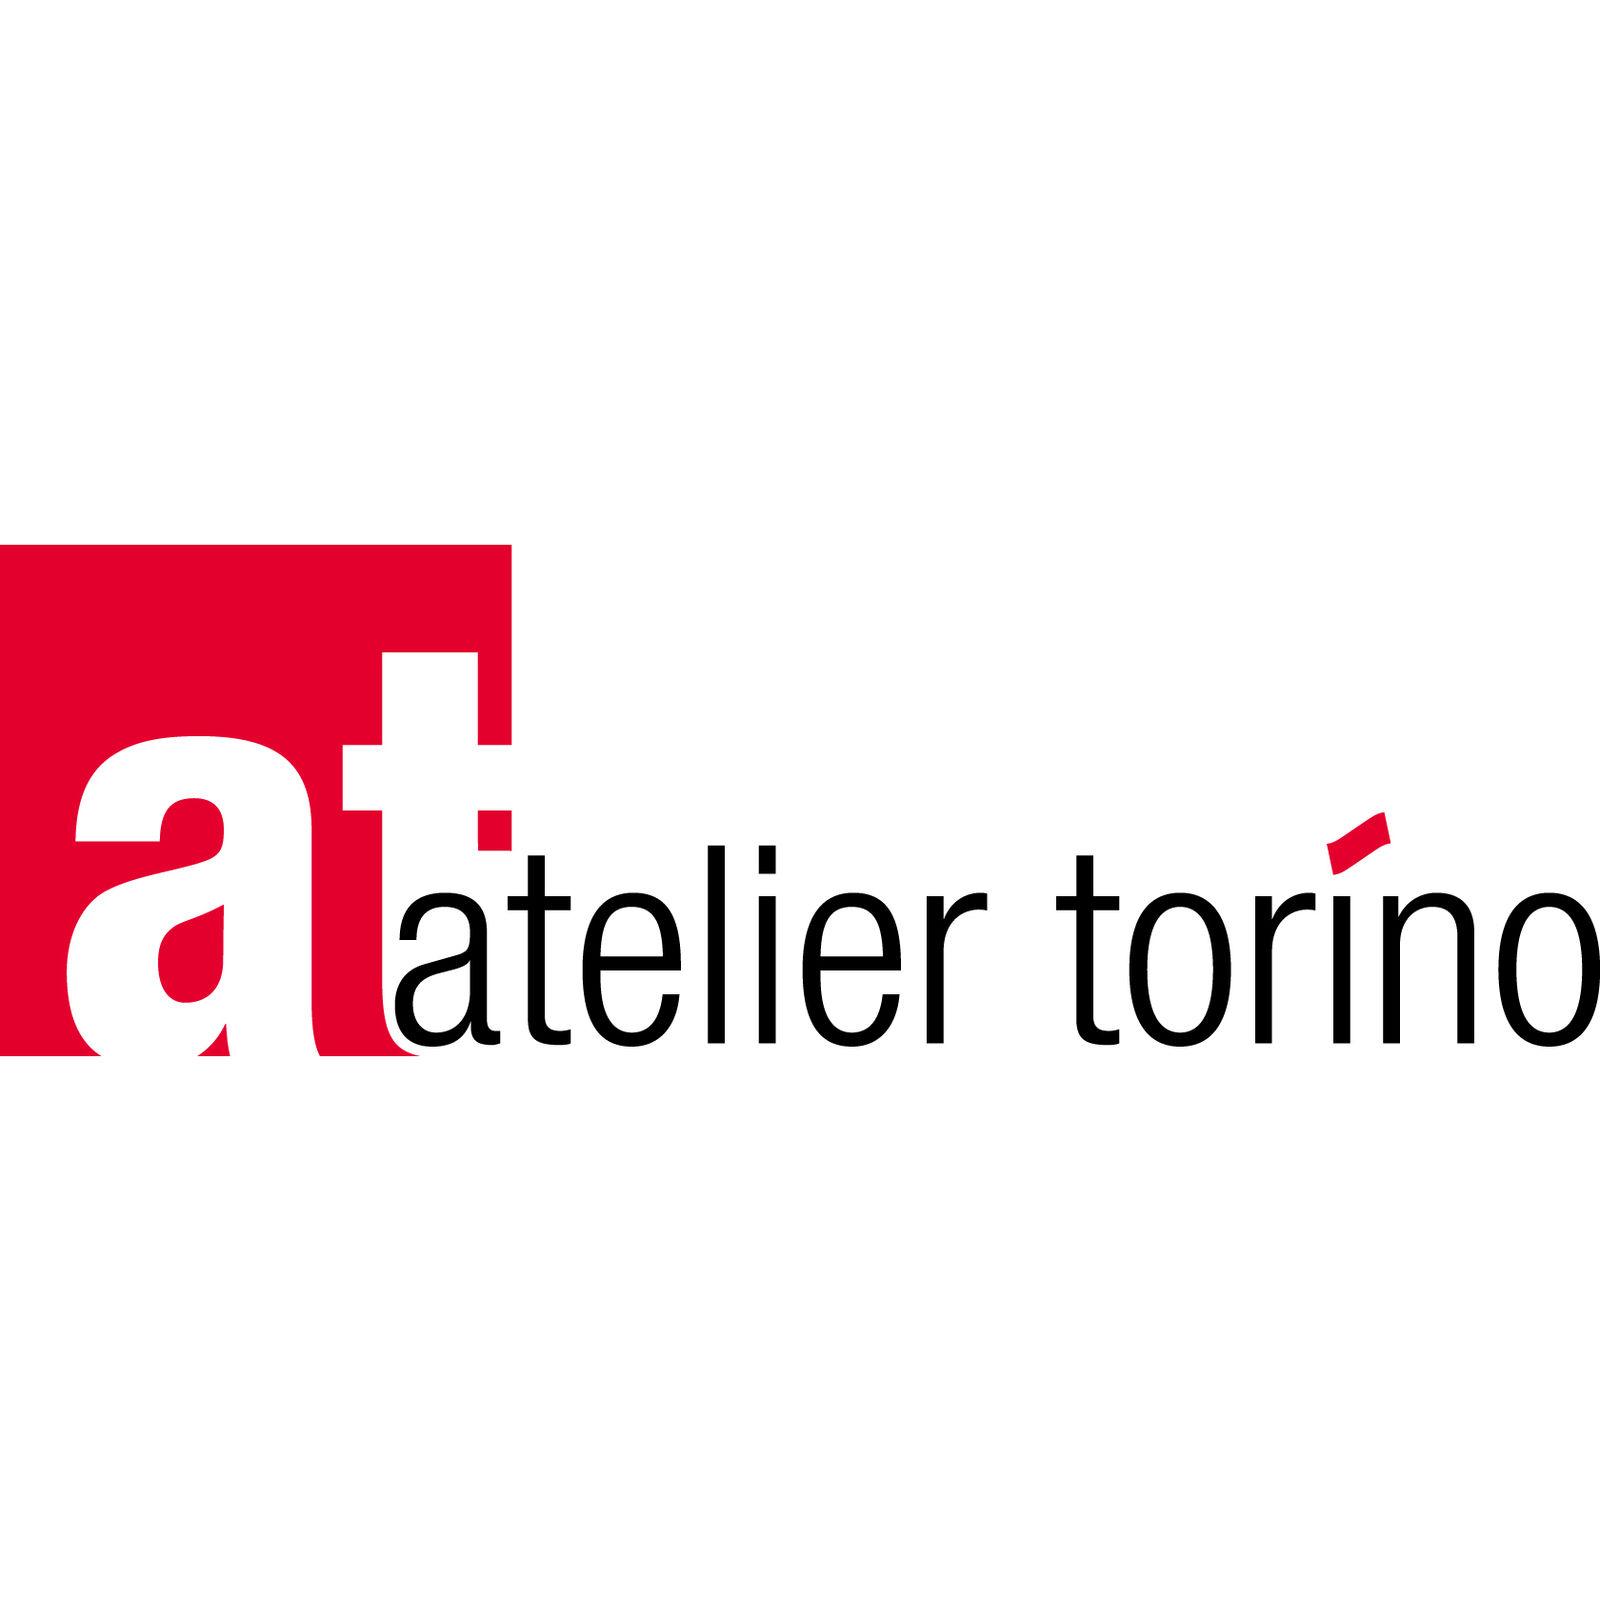 atelier torino (Bild 1)